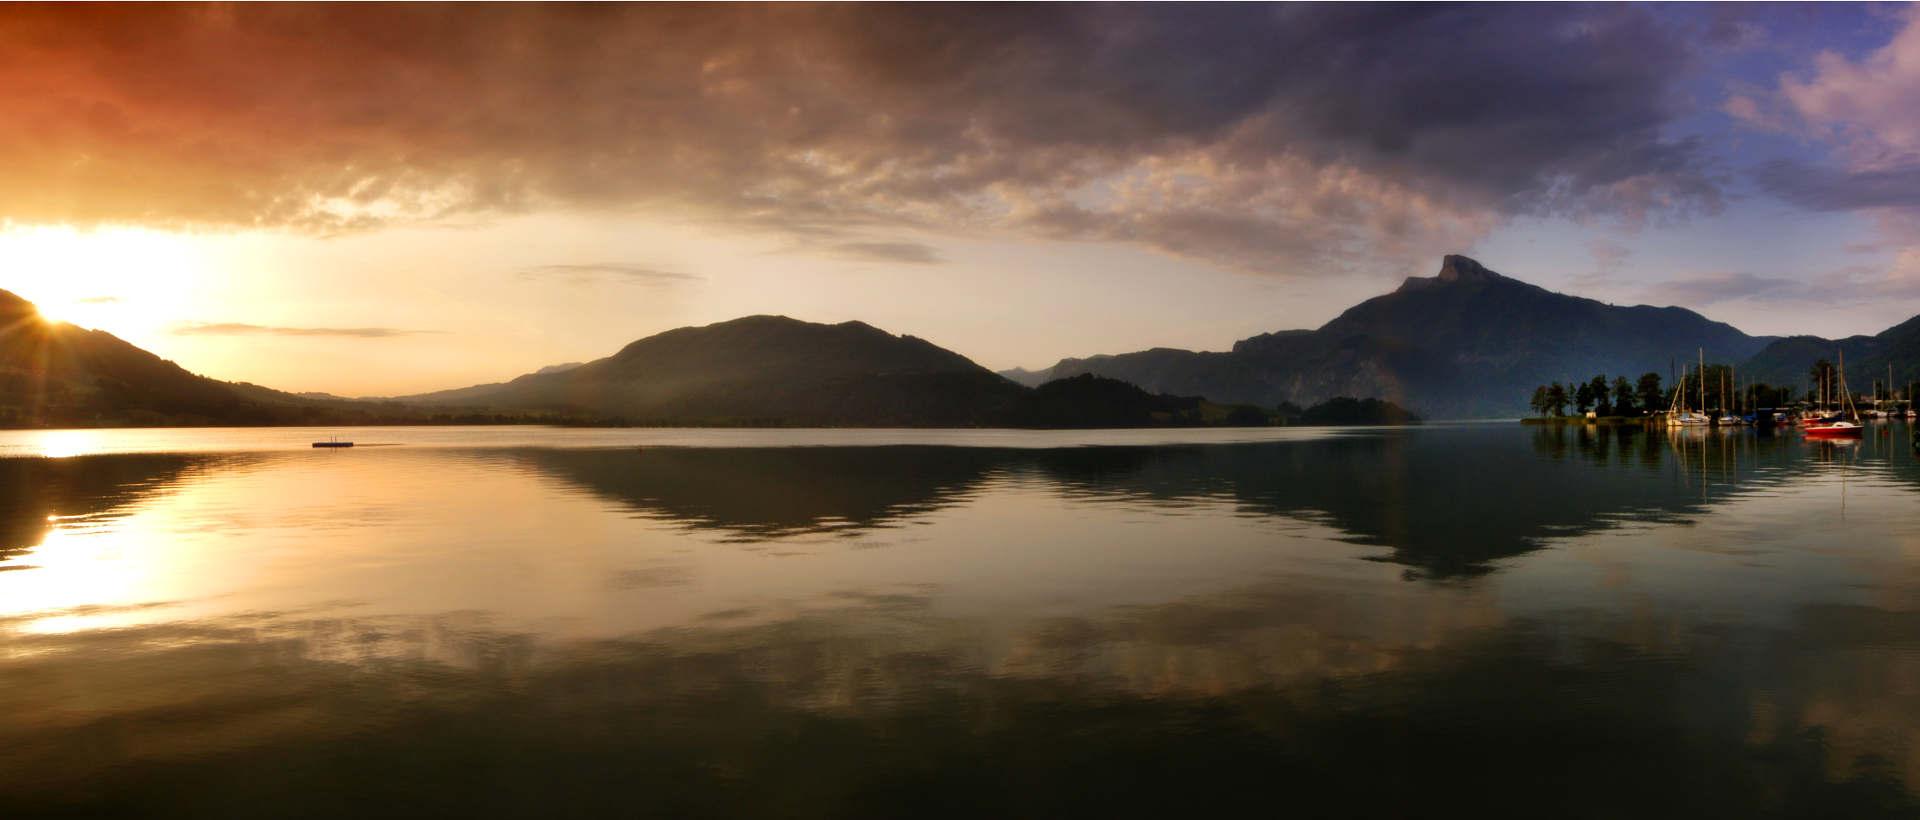 Sonnenuntergang Mondsee © OÖ.Tourismus / Roebl